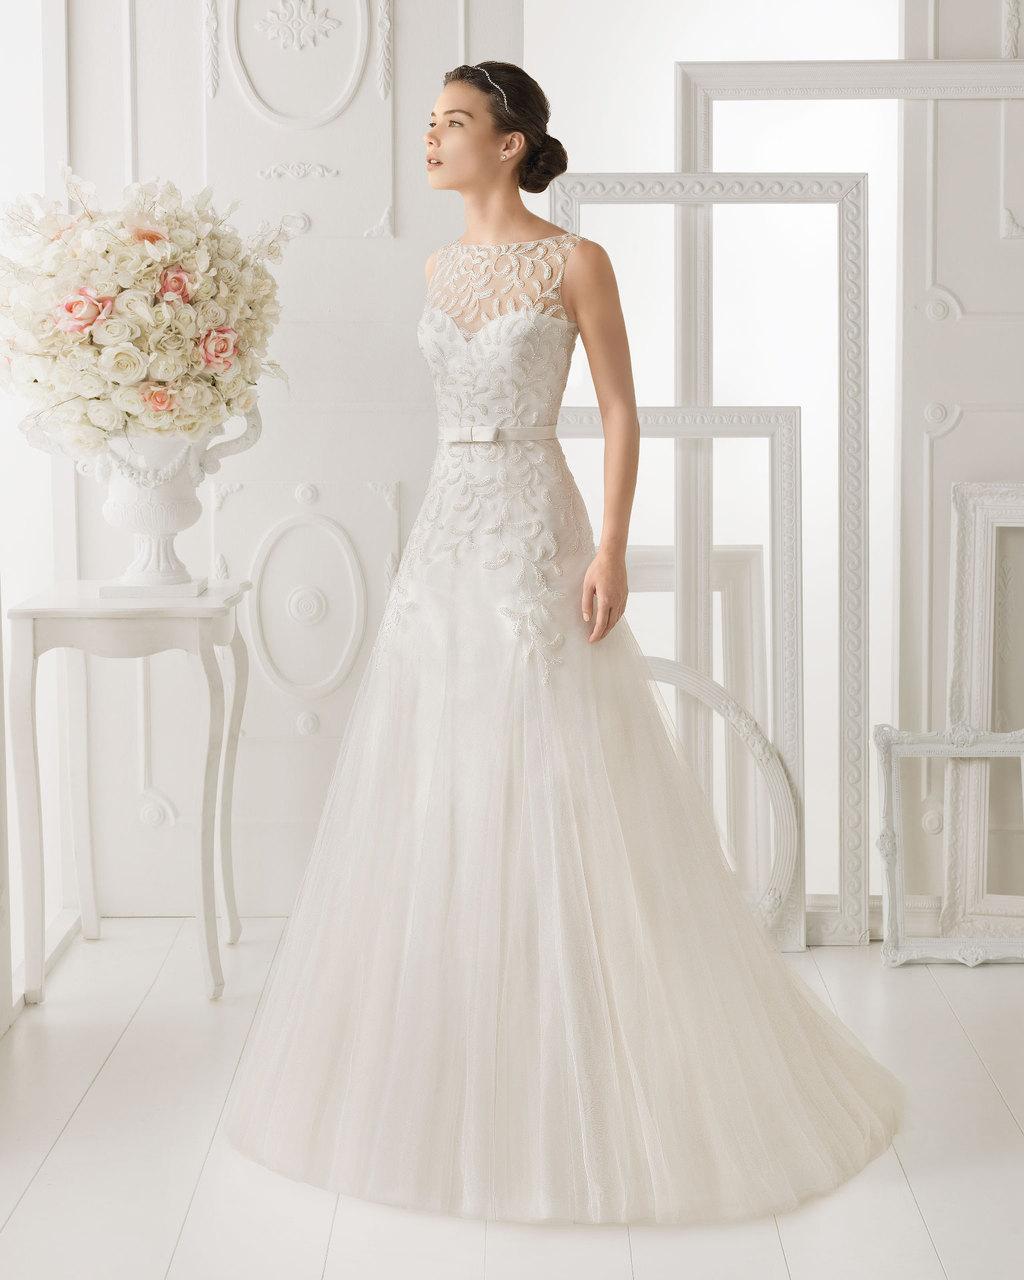 Aire-barcelona-wedding-dress-2014-bridal-ohio.full